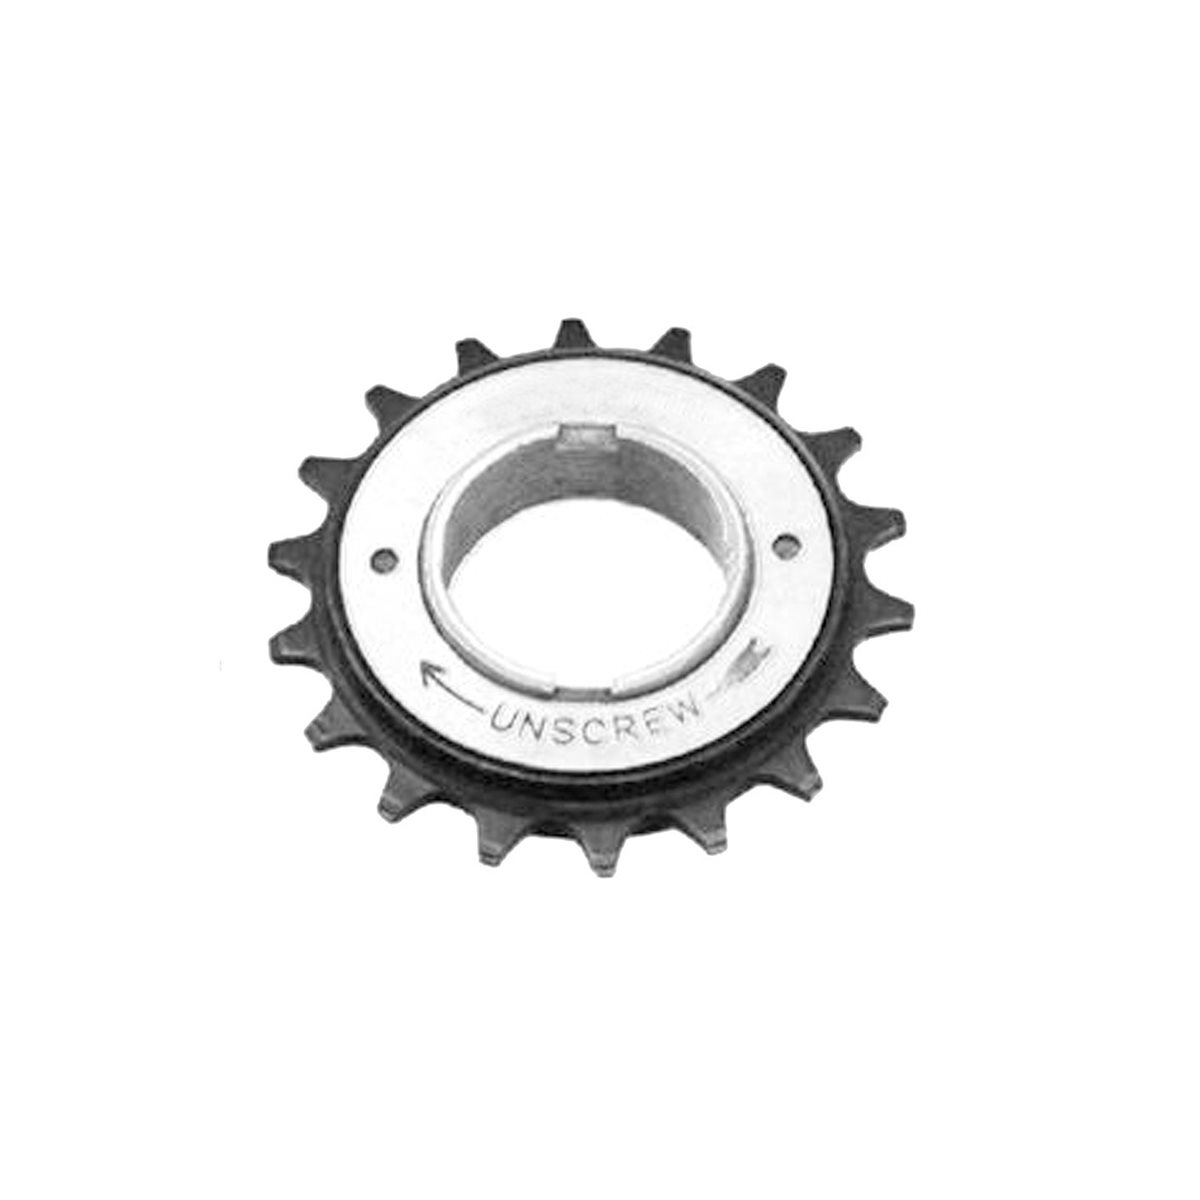 freewheel sprocket single speed 1/2 x 1/8 16t